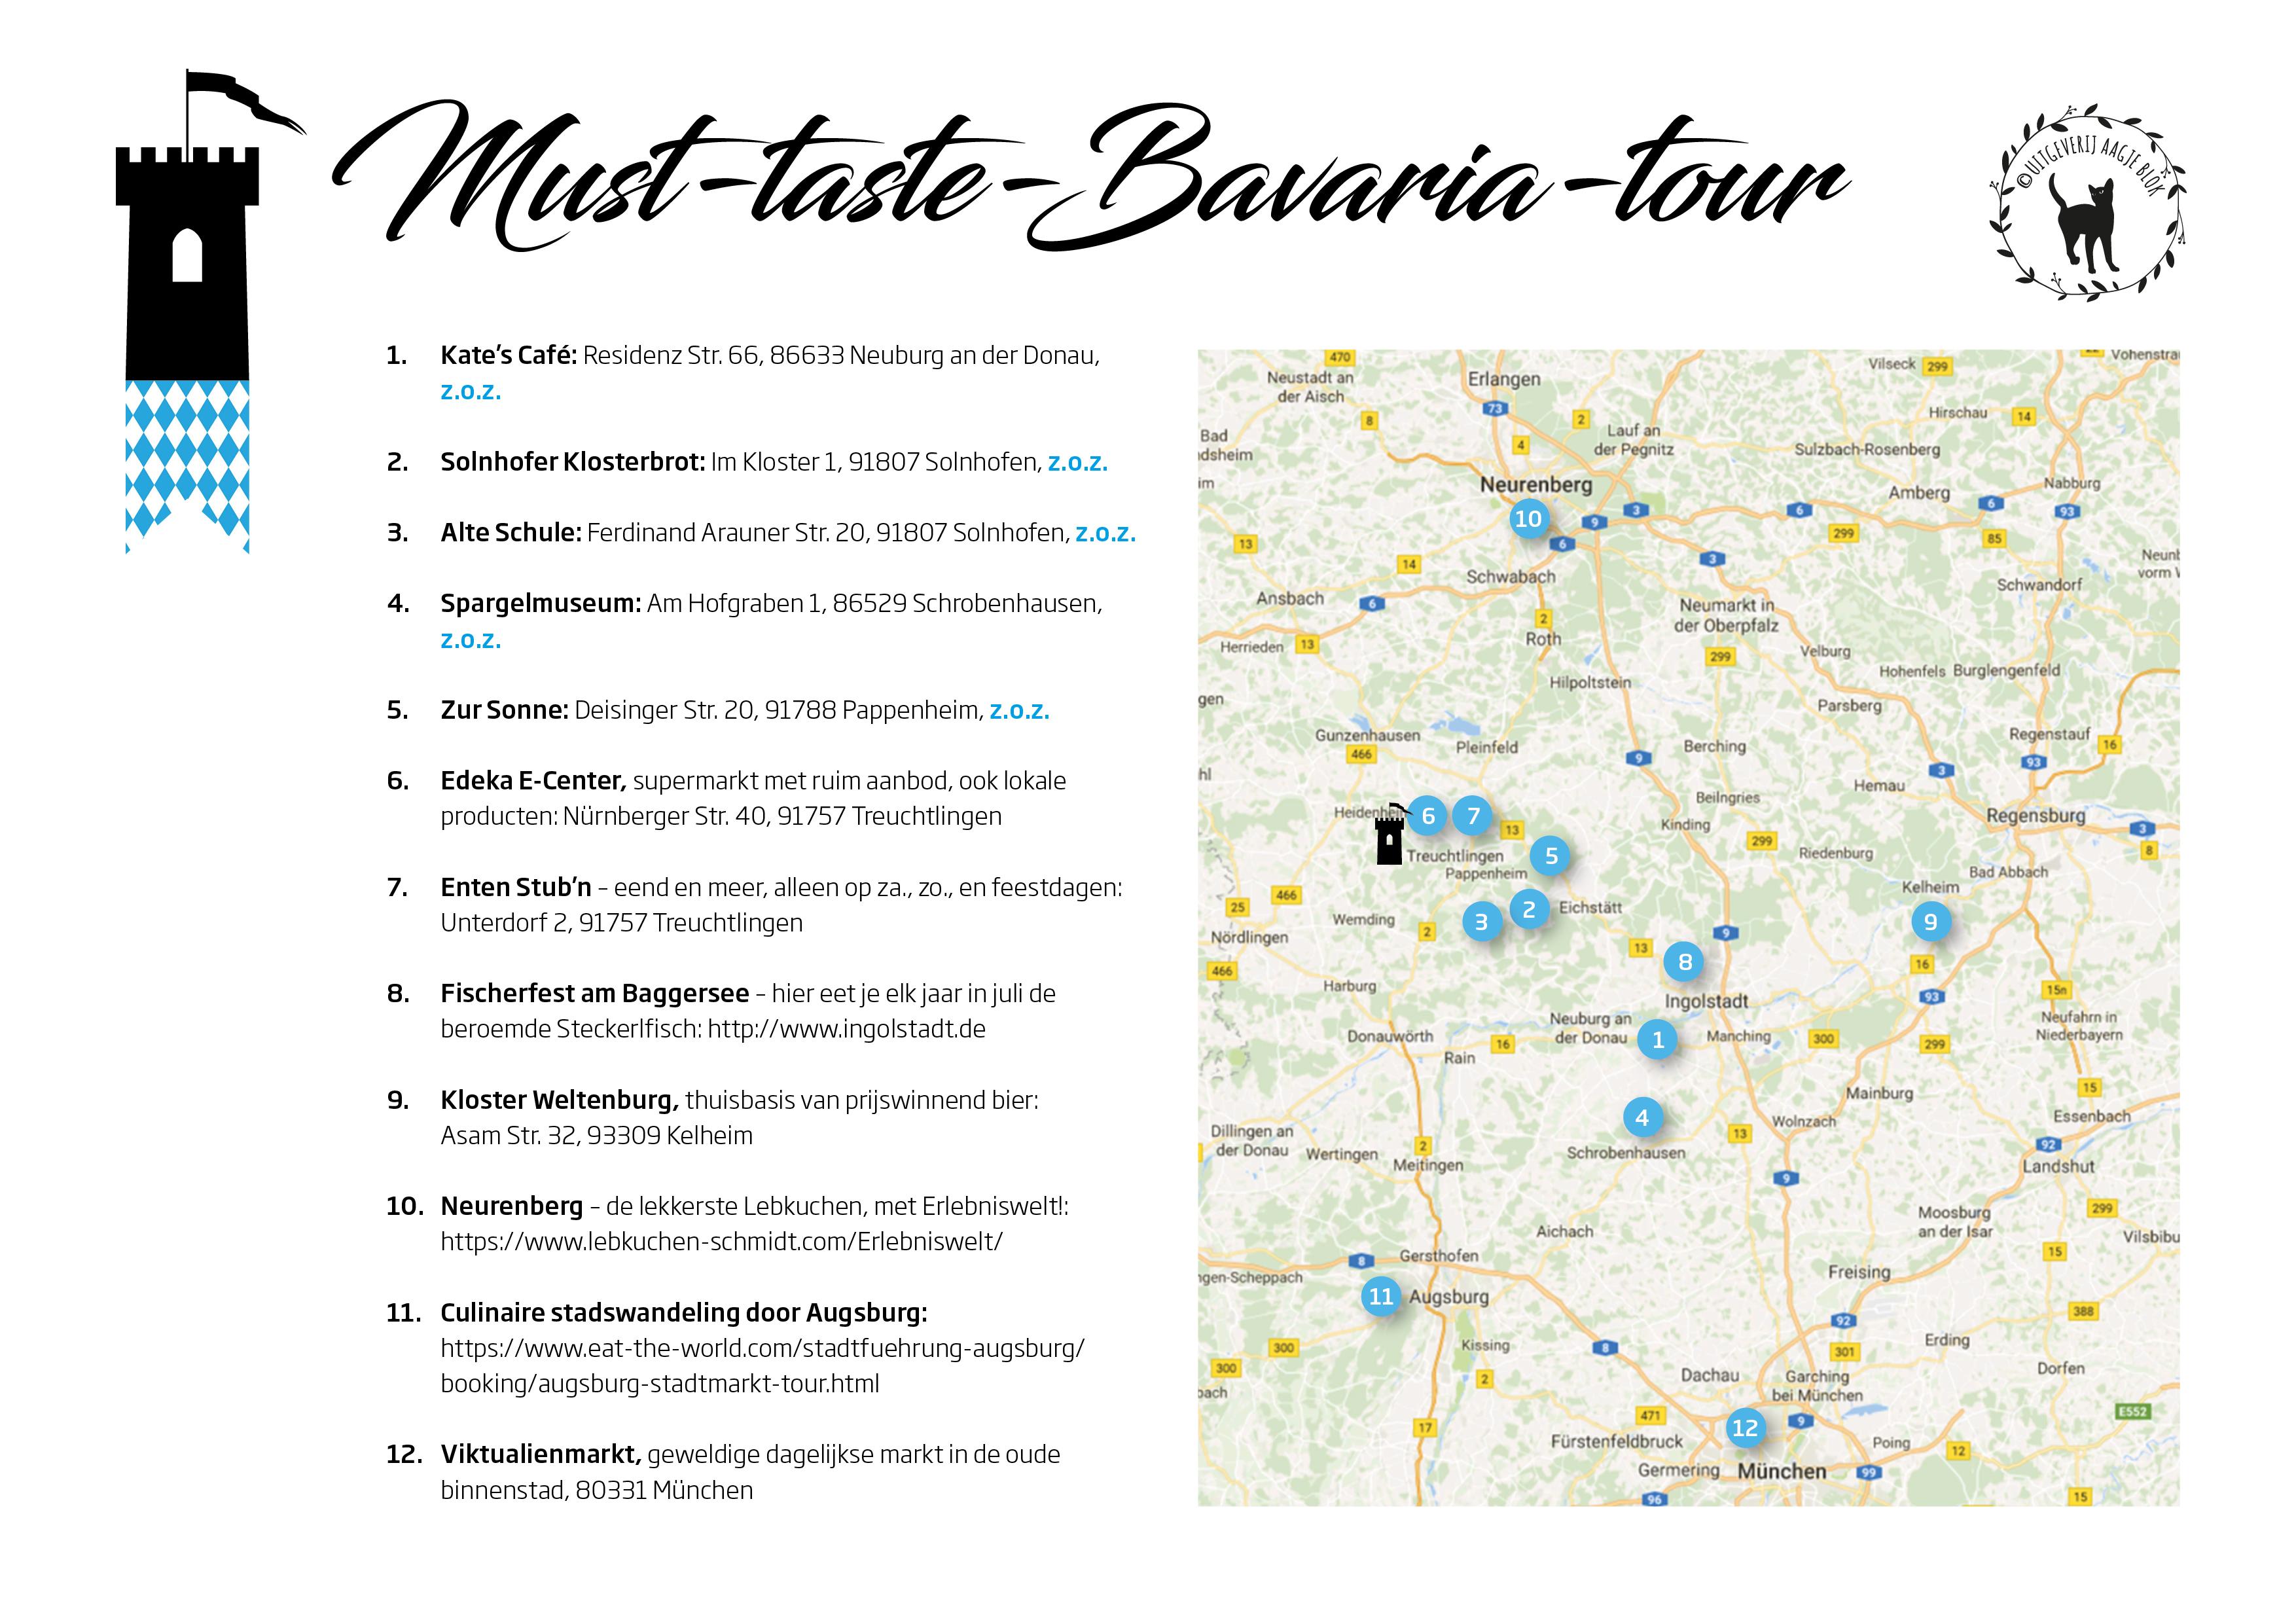 Koch & Must-taste-Bavaria-tour